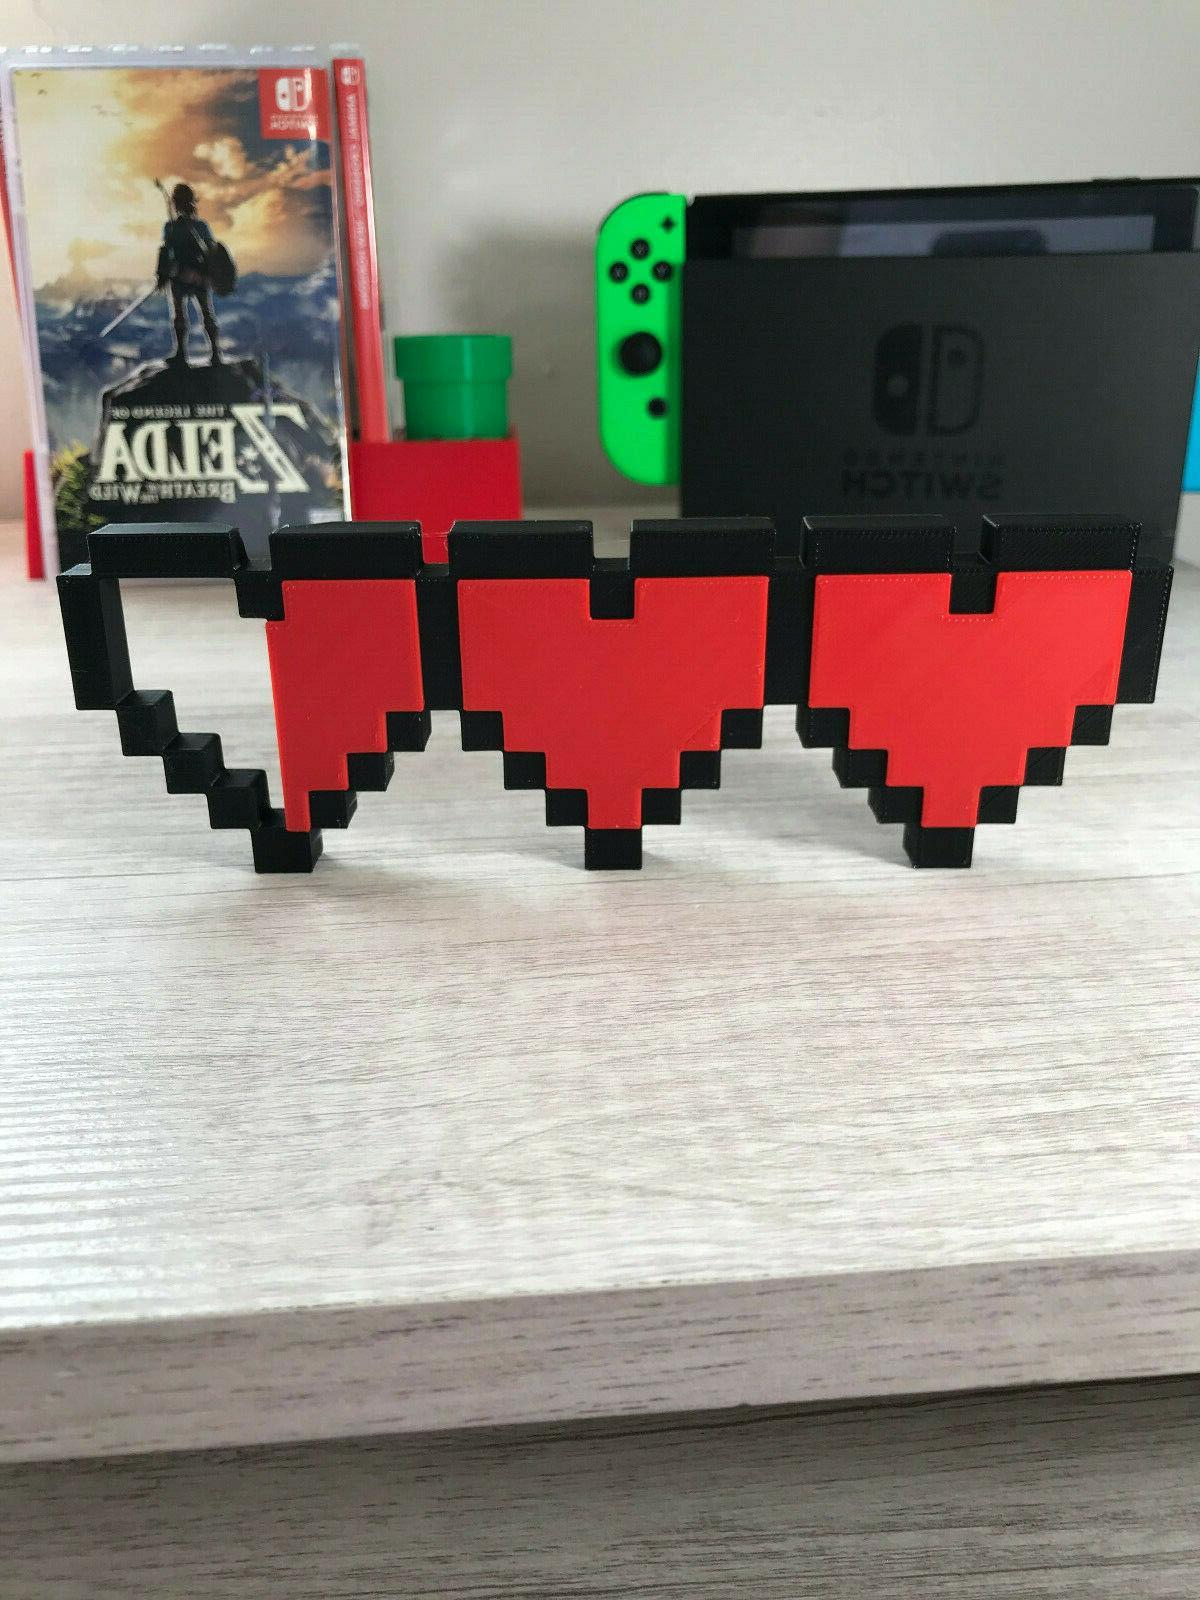 legend of zelda hearts video game logo